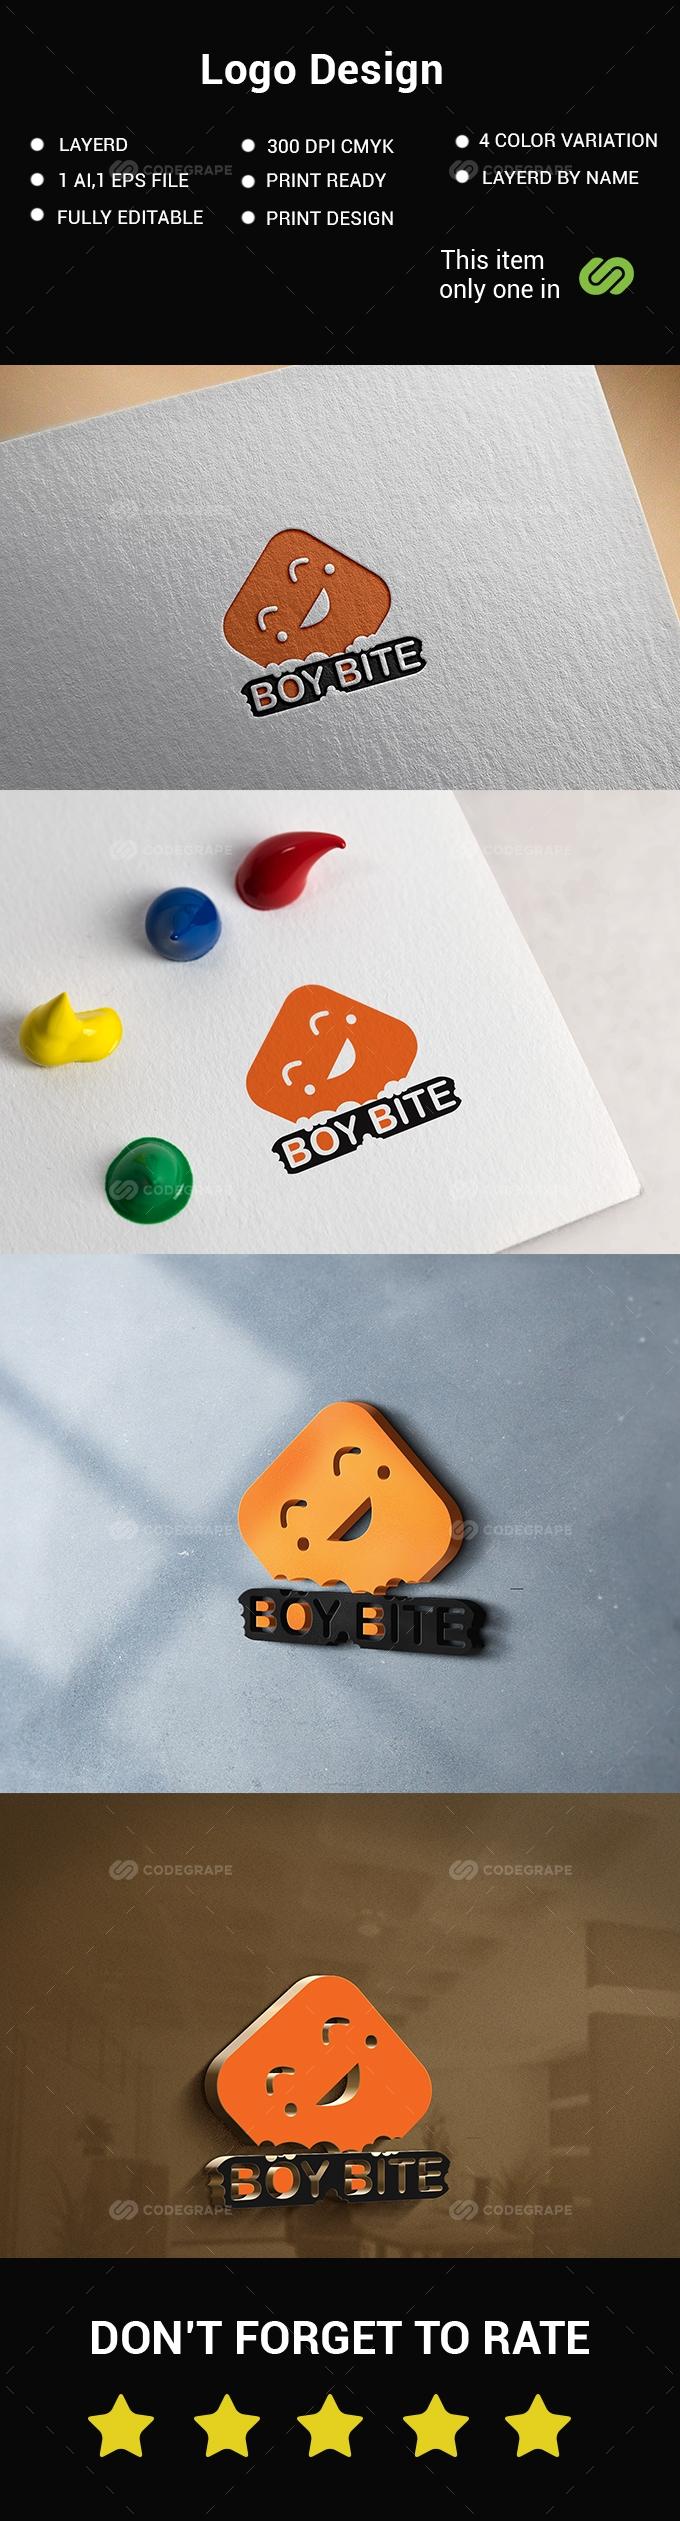 Boy Bite Logo Design